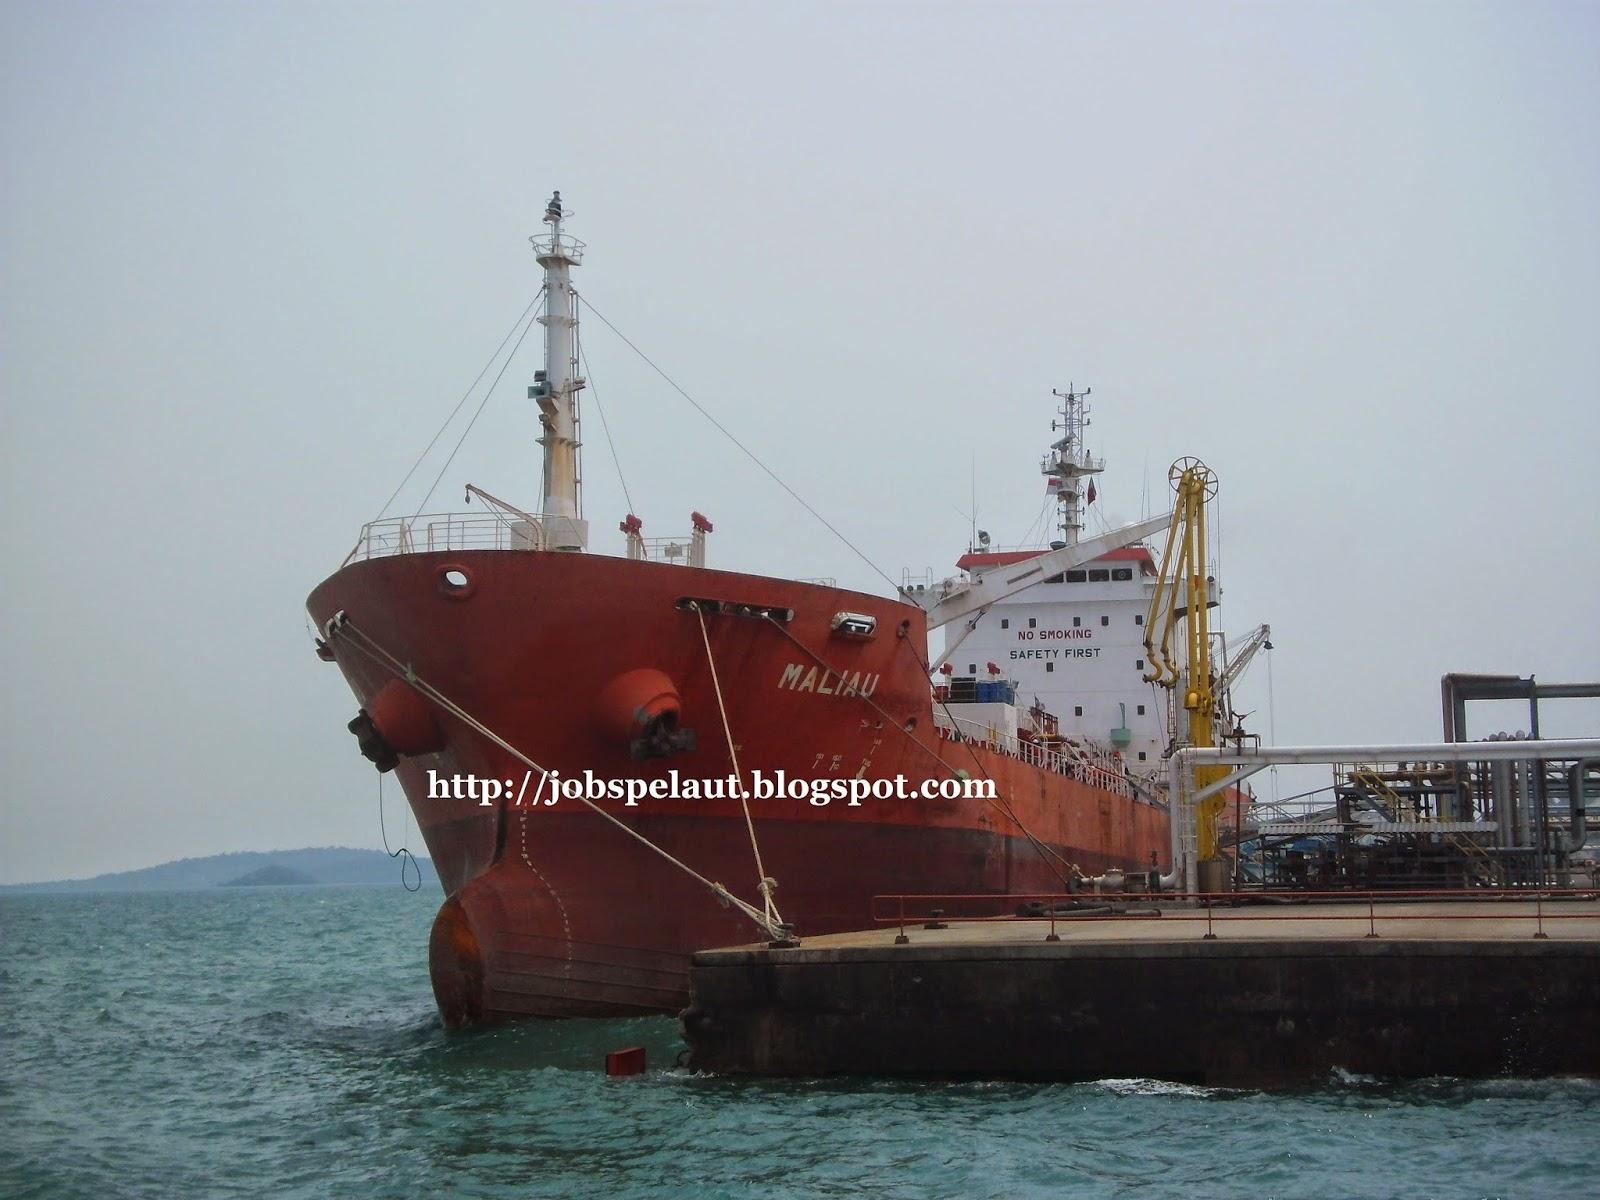 Lowongan Kerja Lowongan Koki di Kapal LPG Tanker PT. World Jabo ...